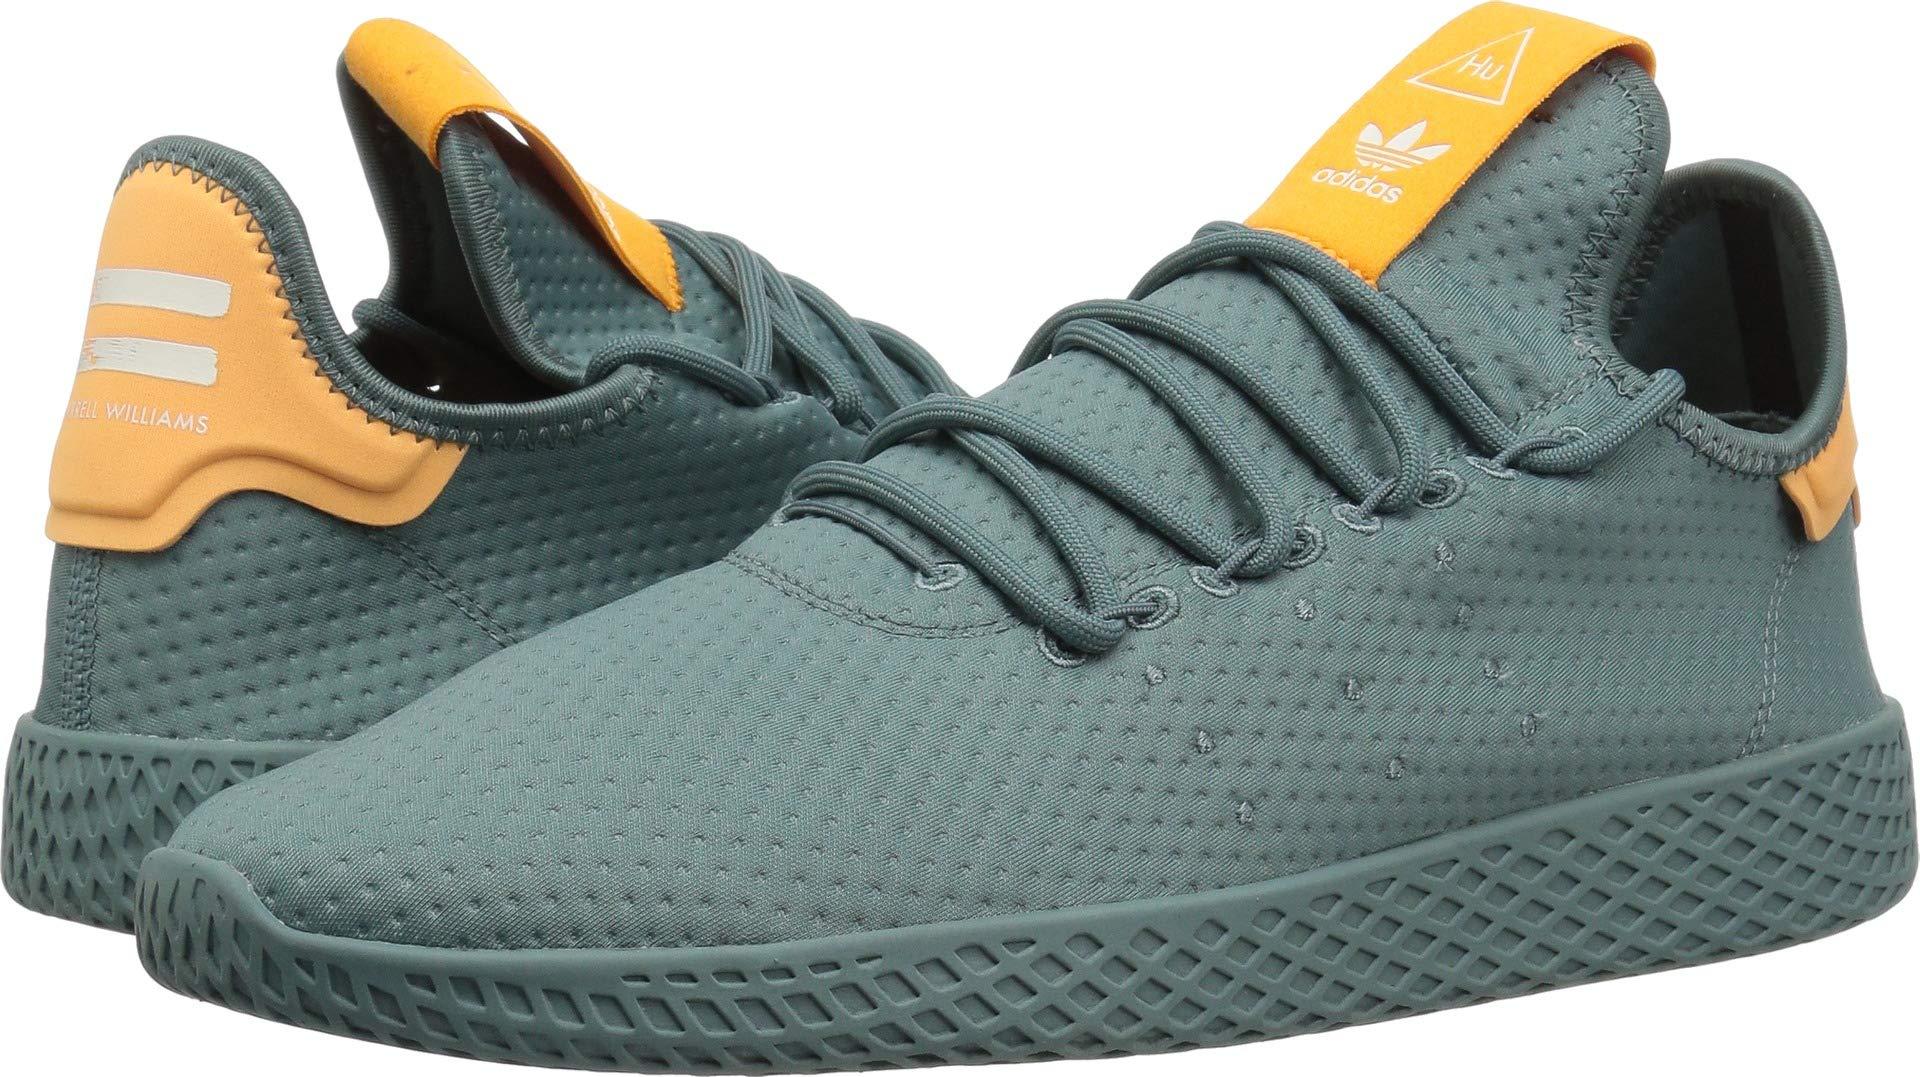 df5a77413b8 adidas Originals Men s Pharrell Williams Tennis HU Running Shoe raw Green Off  White